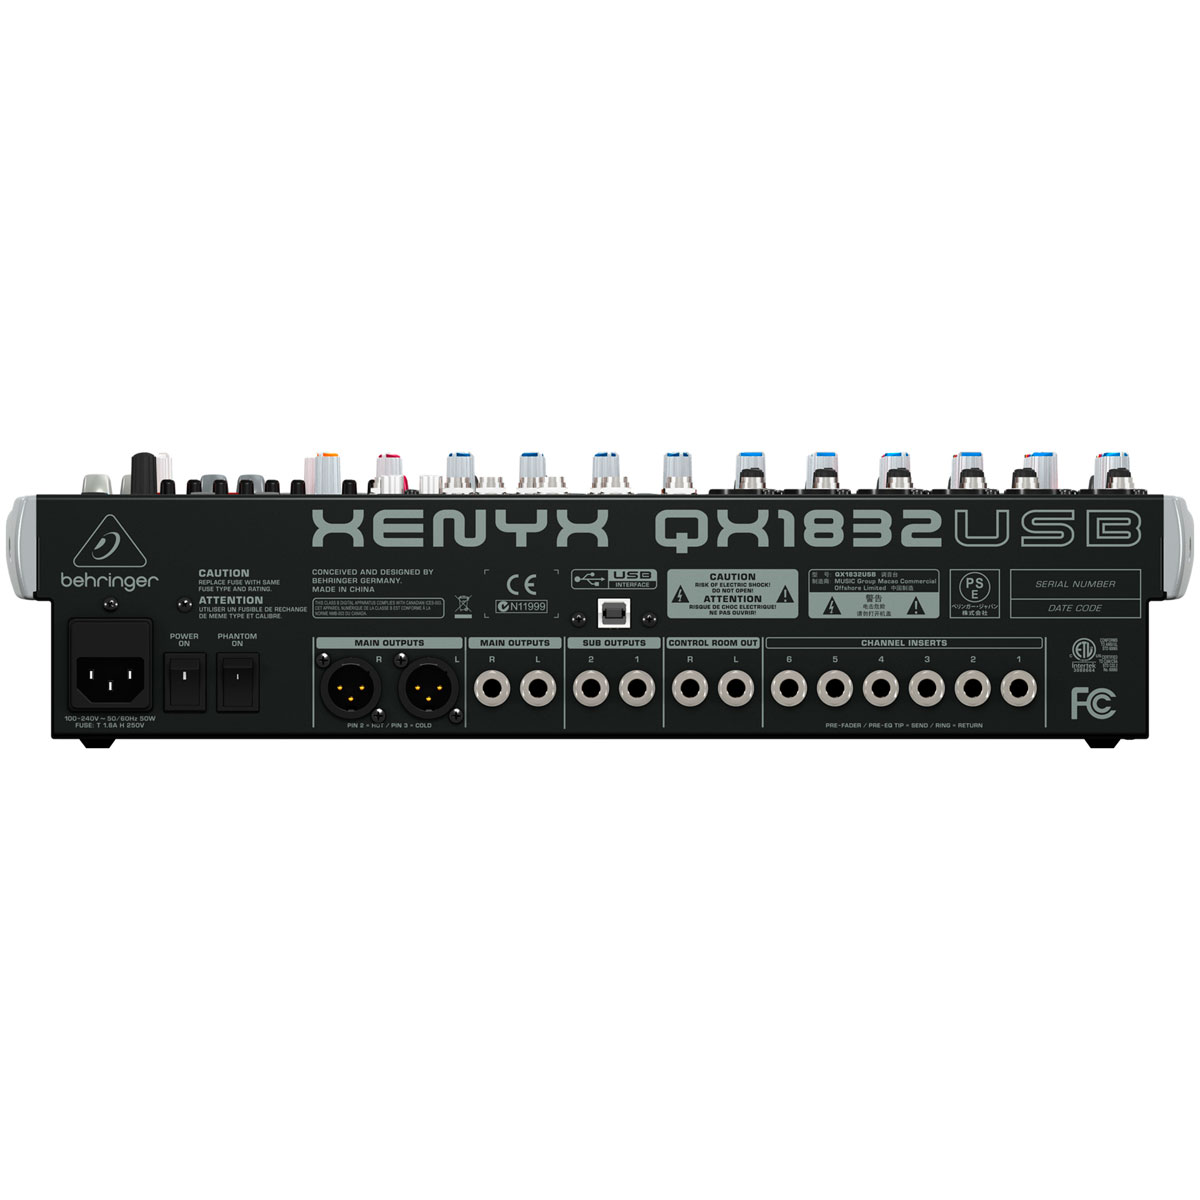 Mesa de Som 18 Canais Balanceados (6 XLR + 12 P10) c/ USB / Efeito / Phantom / 3 Auxiliares Xenyx QX 1832 USB - Behringer